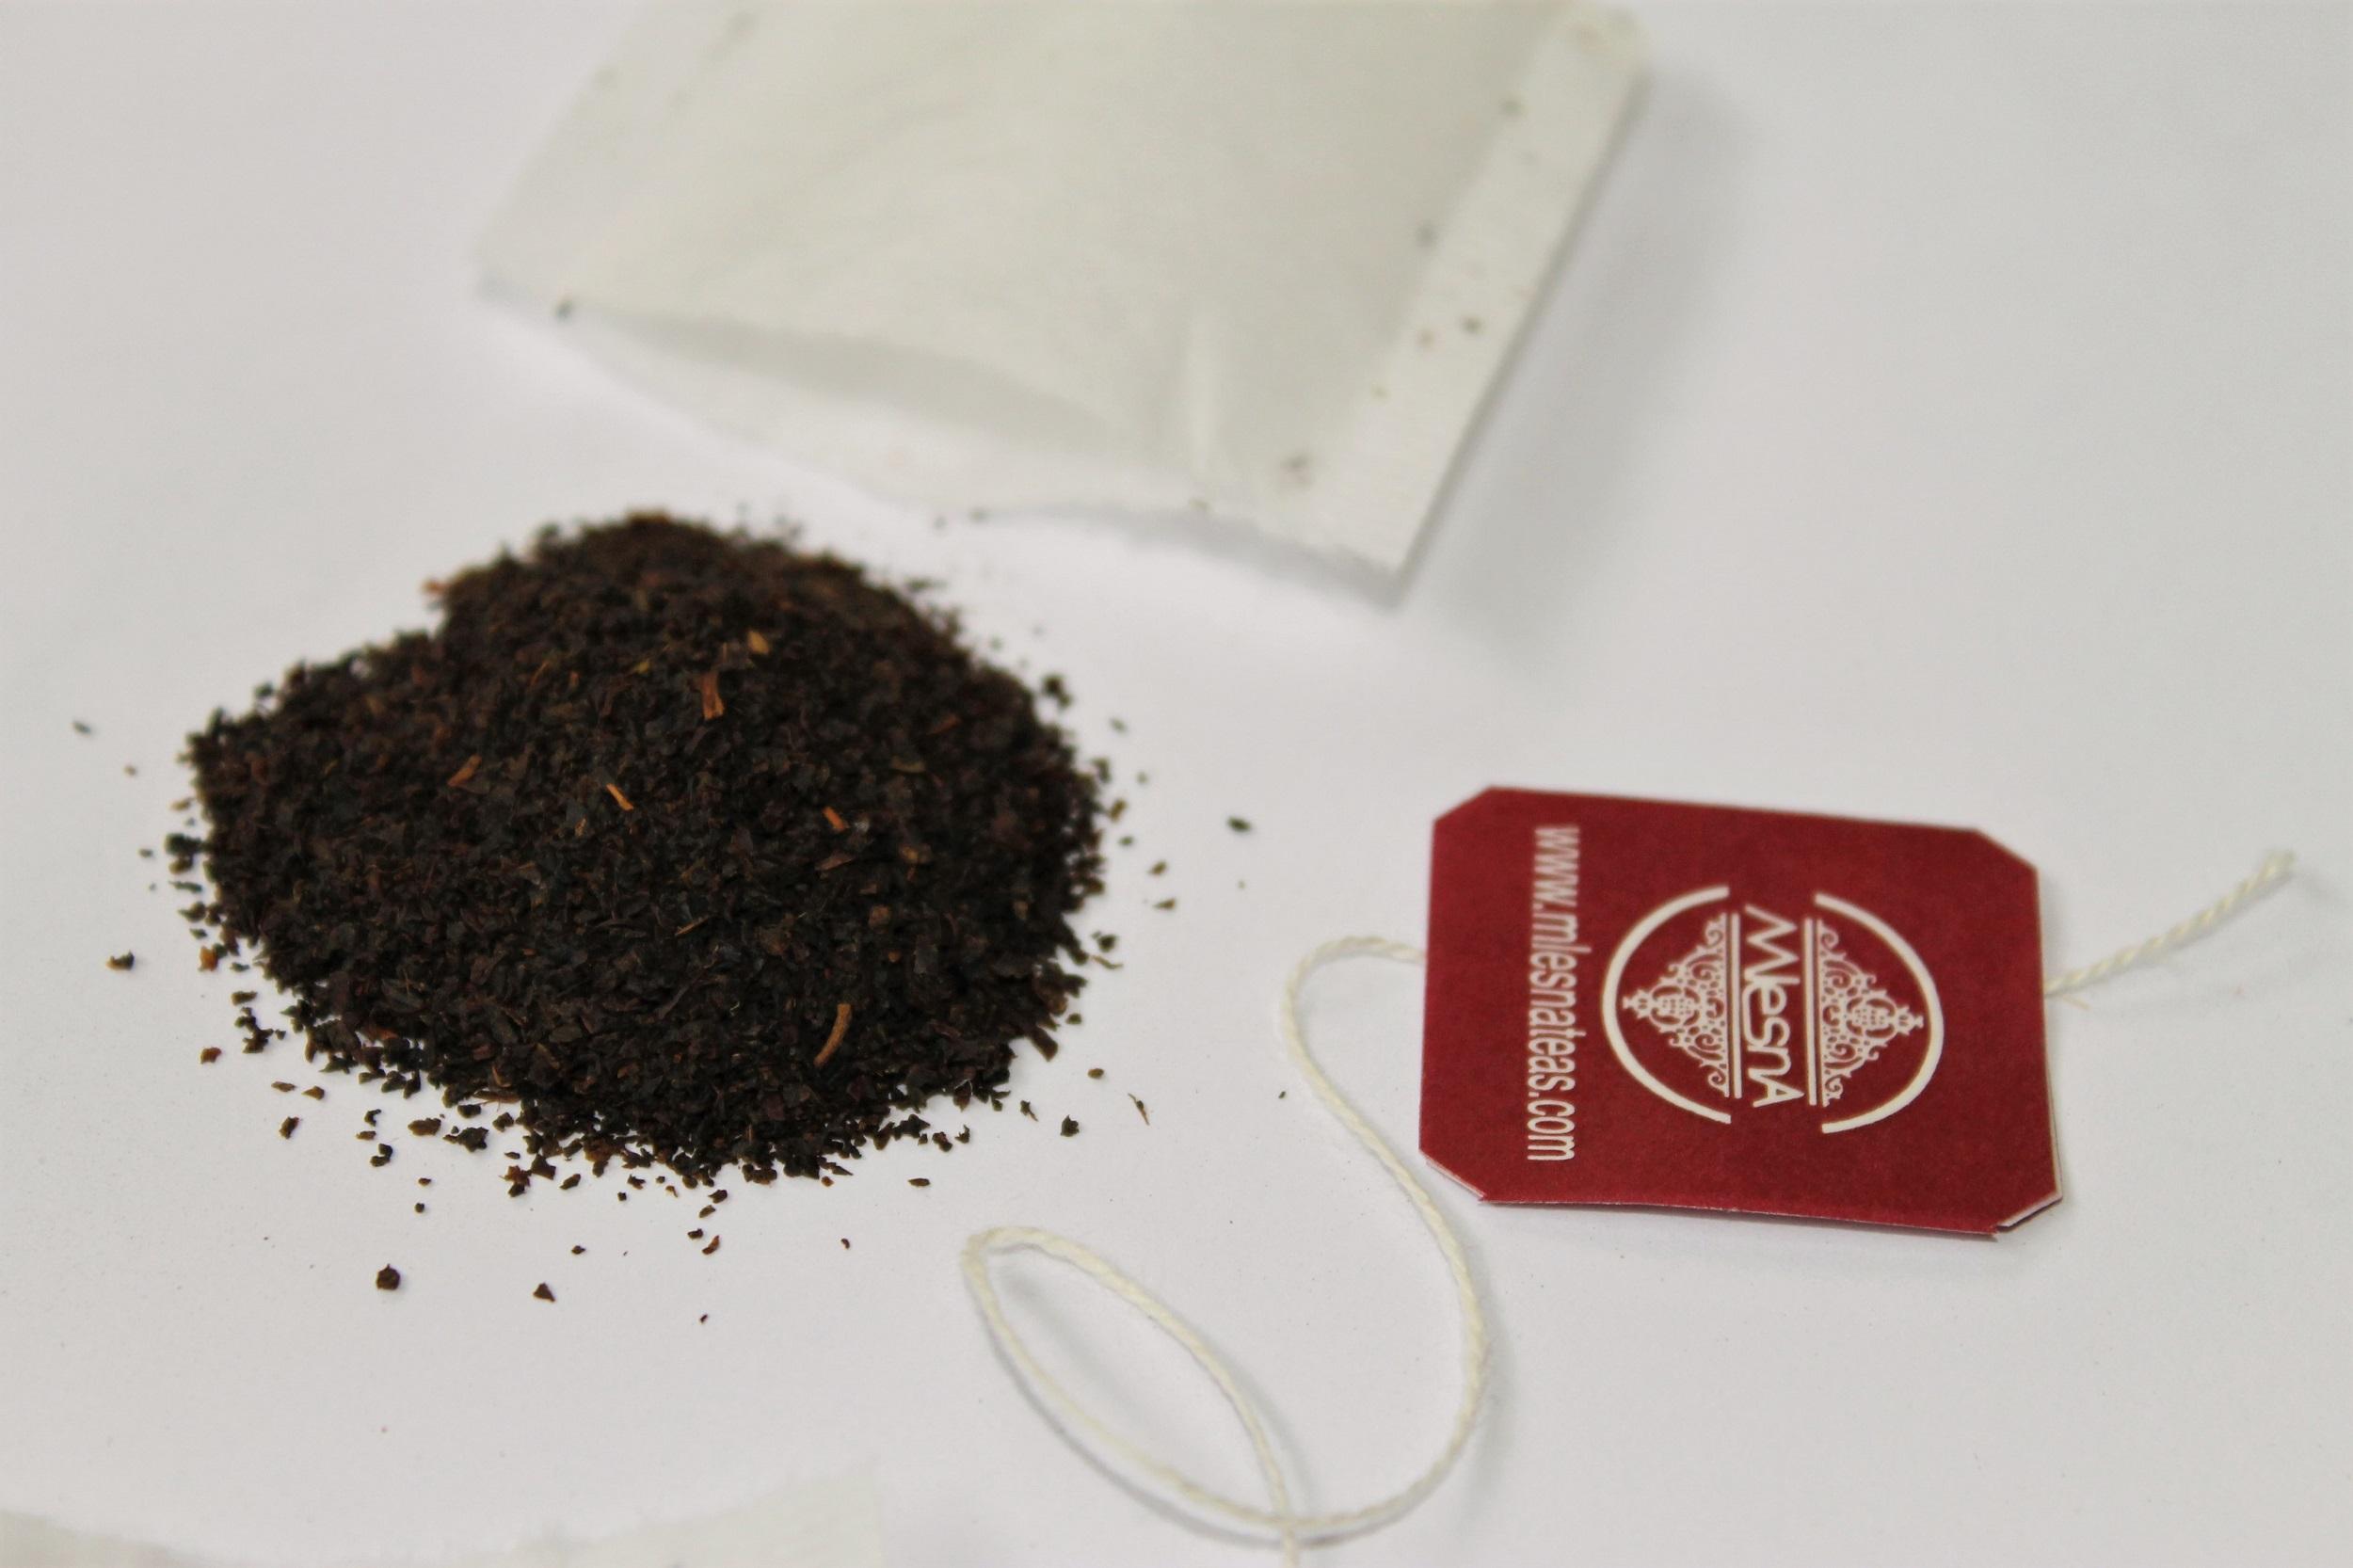 mlesna ceylon black tea